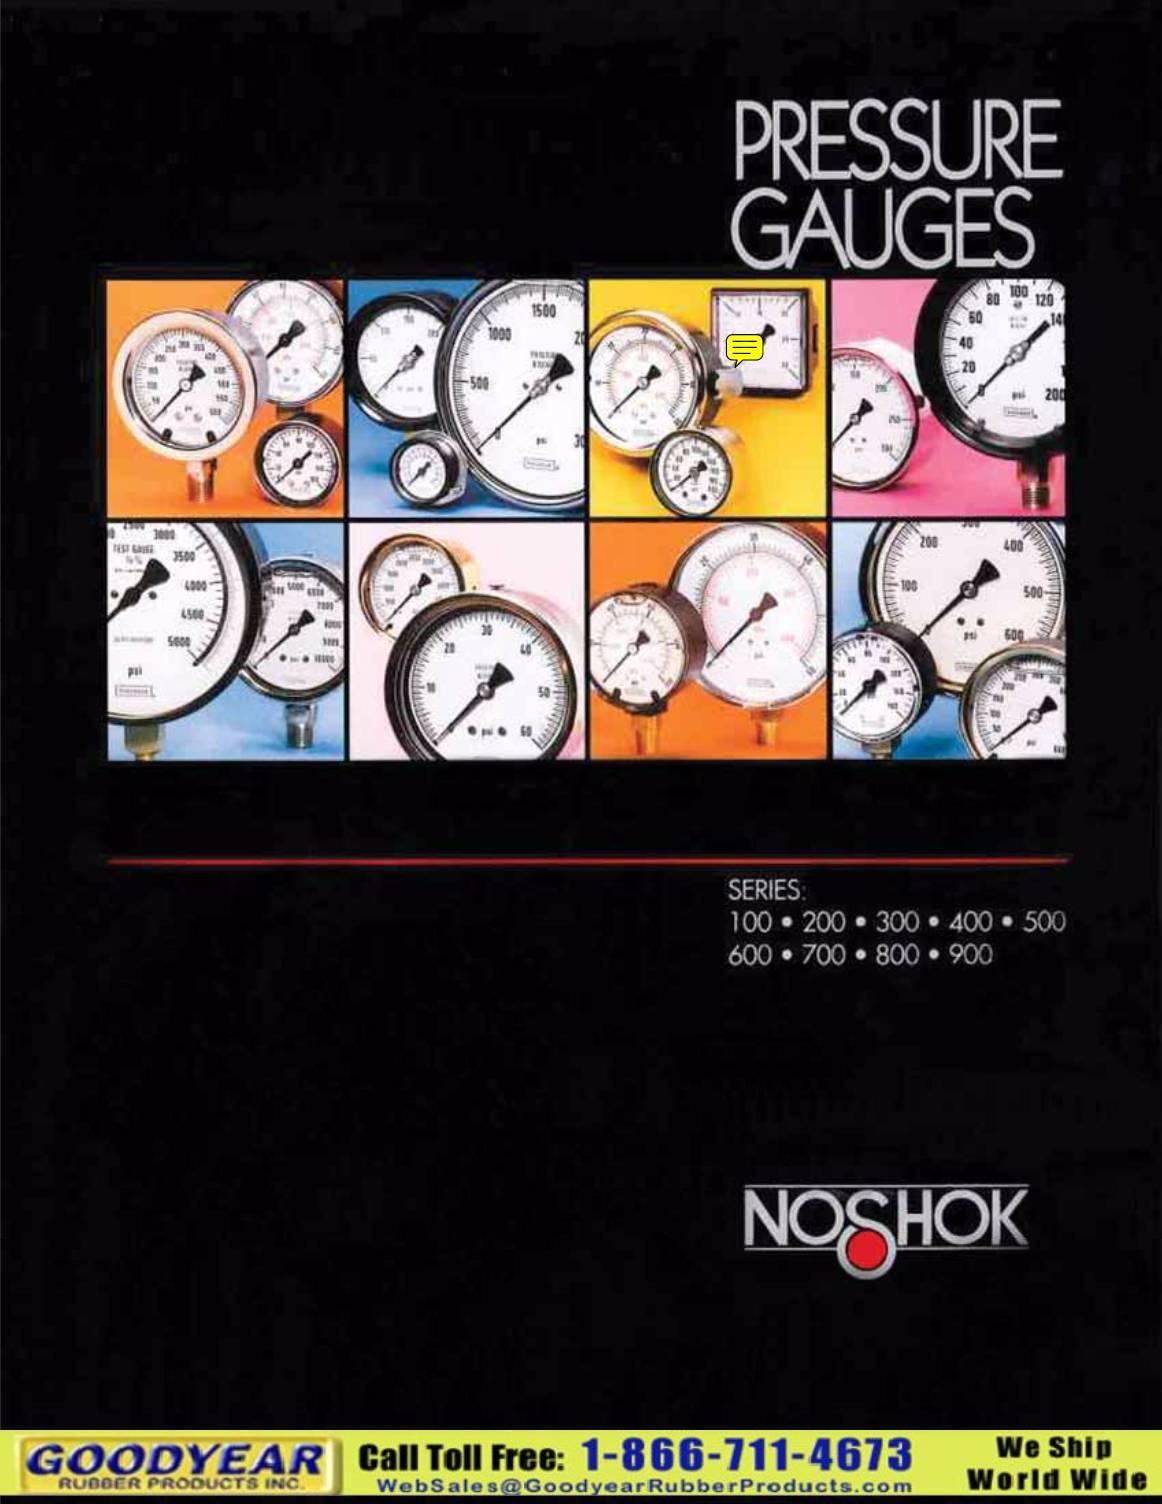 NOSHOK pressure gauges